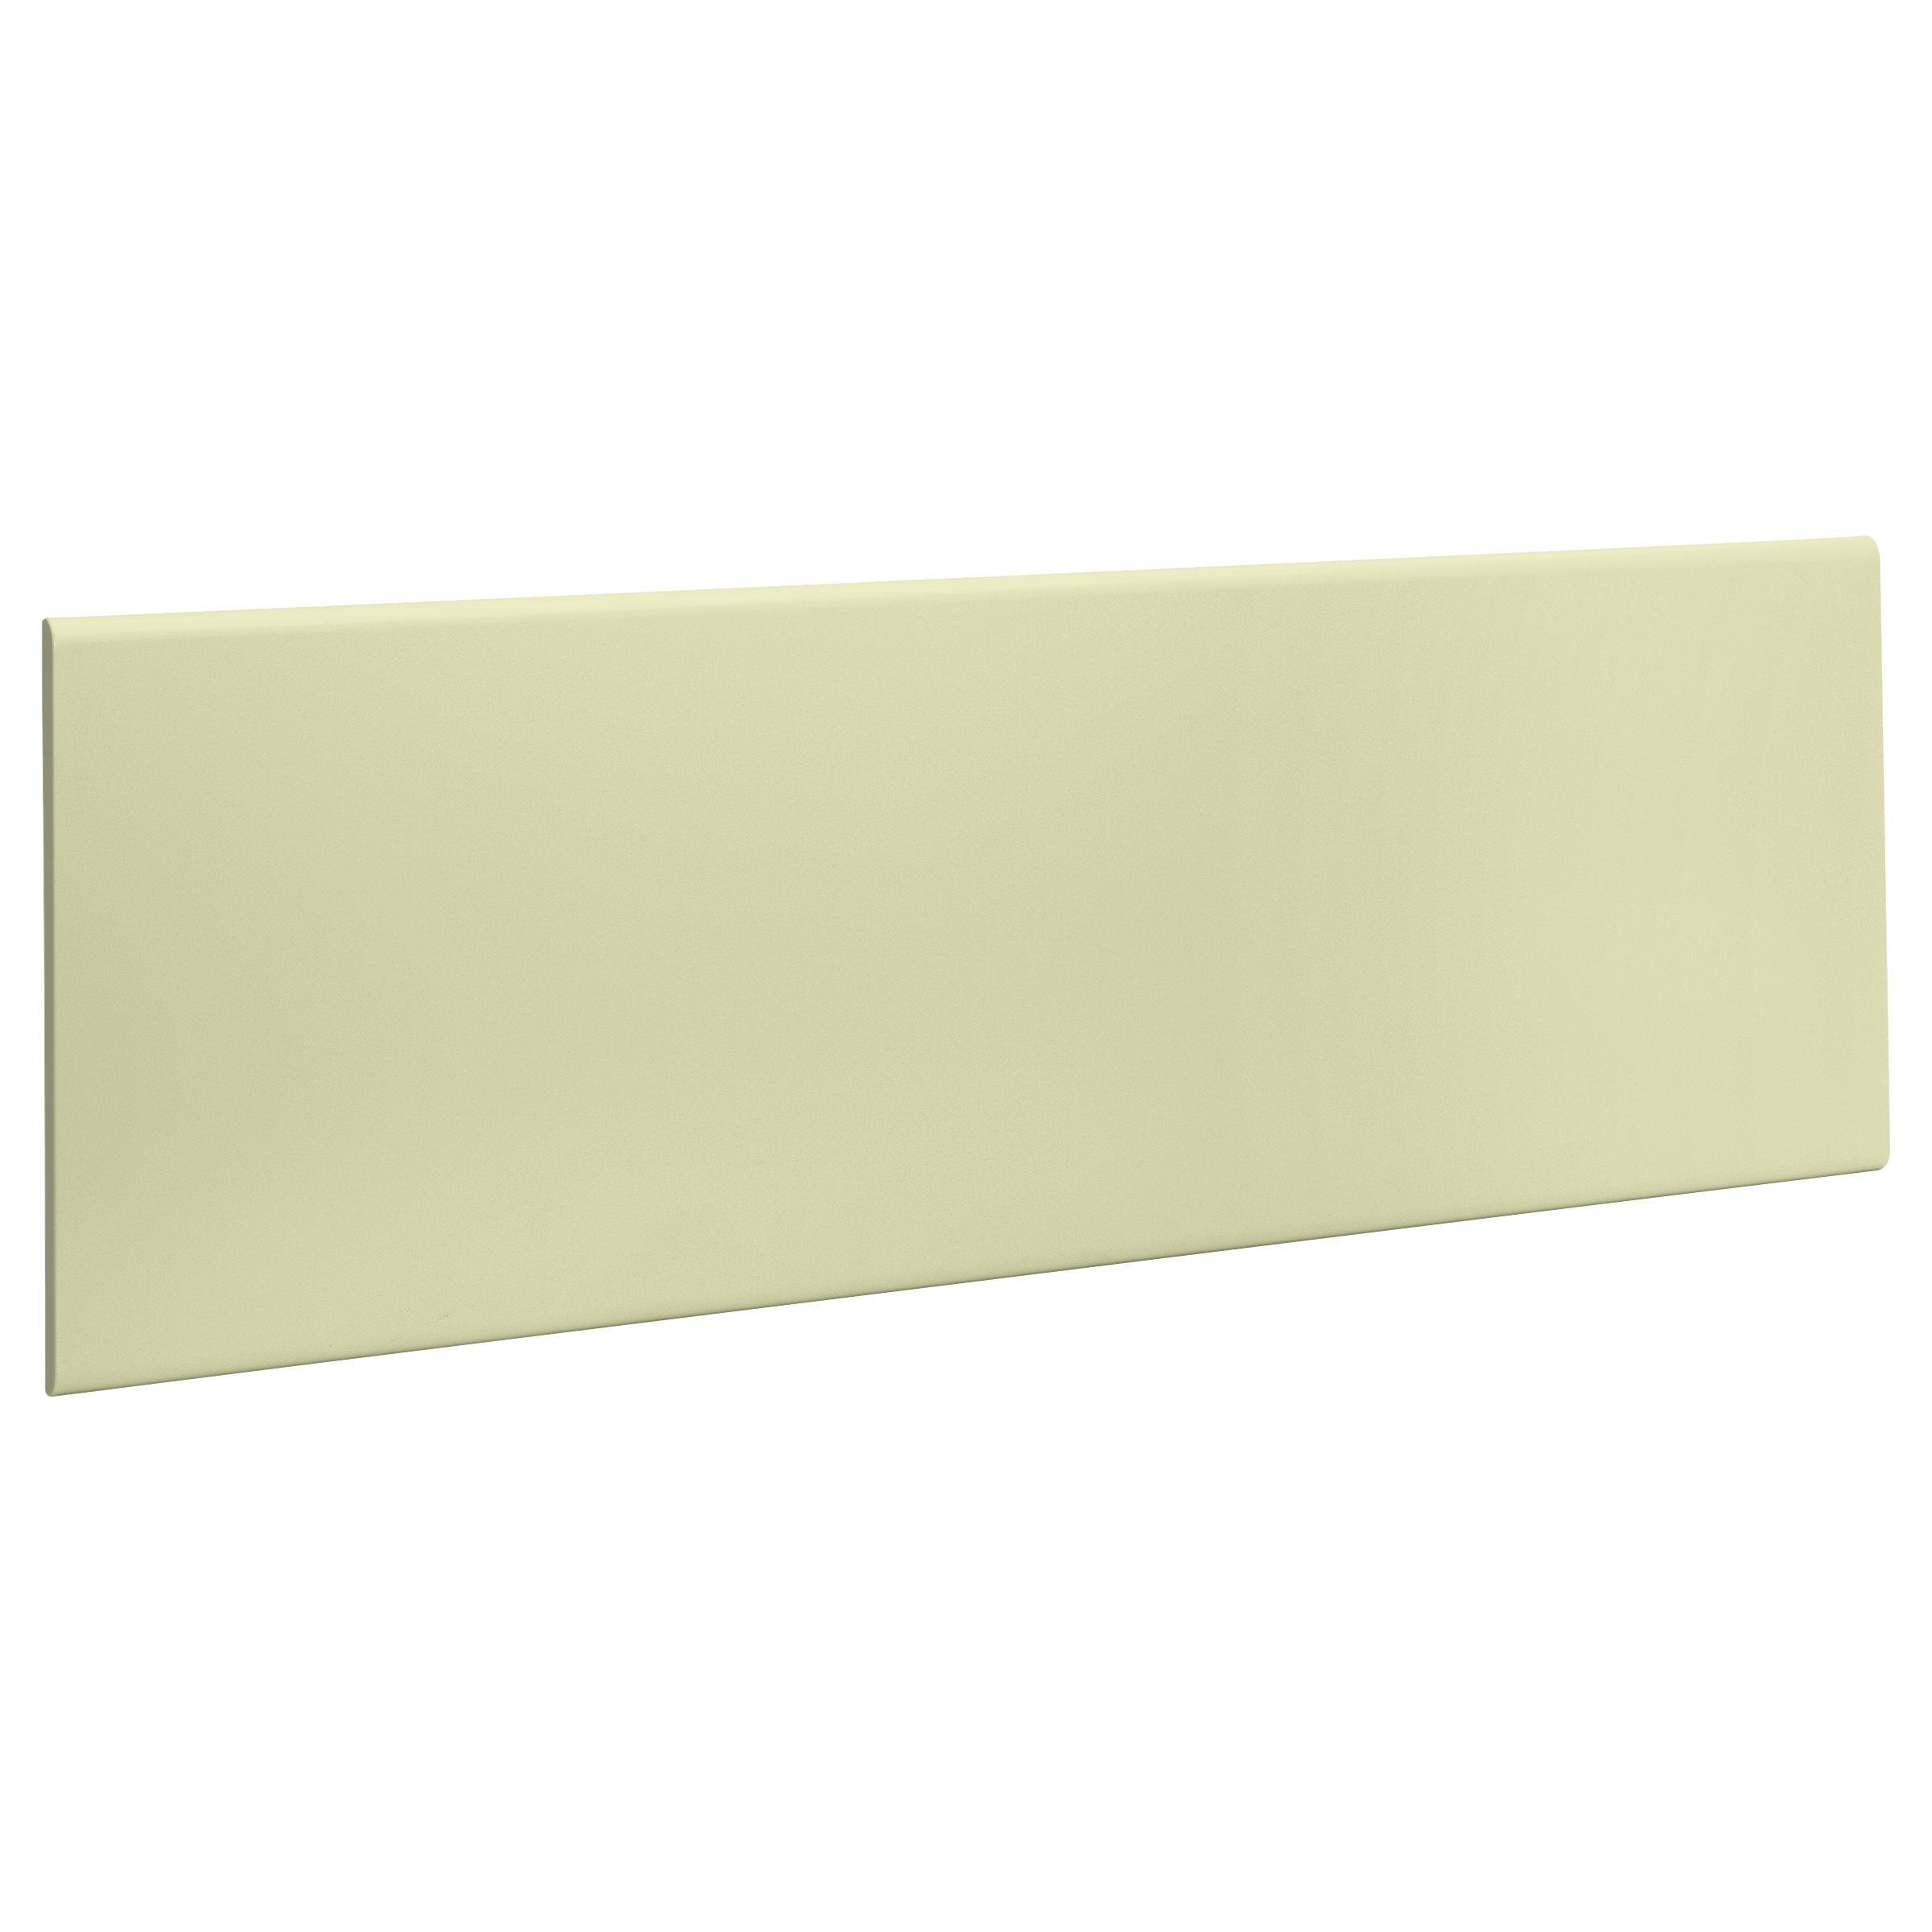 HON 384815LL 38000 Series Hutch Flipper Doors For 48'' w Open Shelf, 48w x 15h, Putty